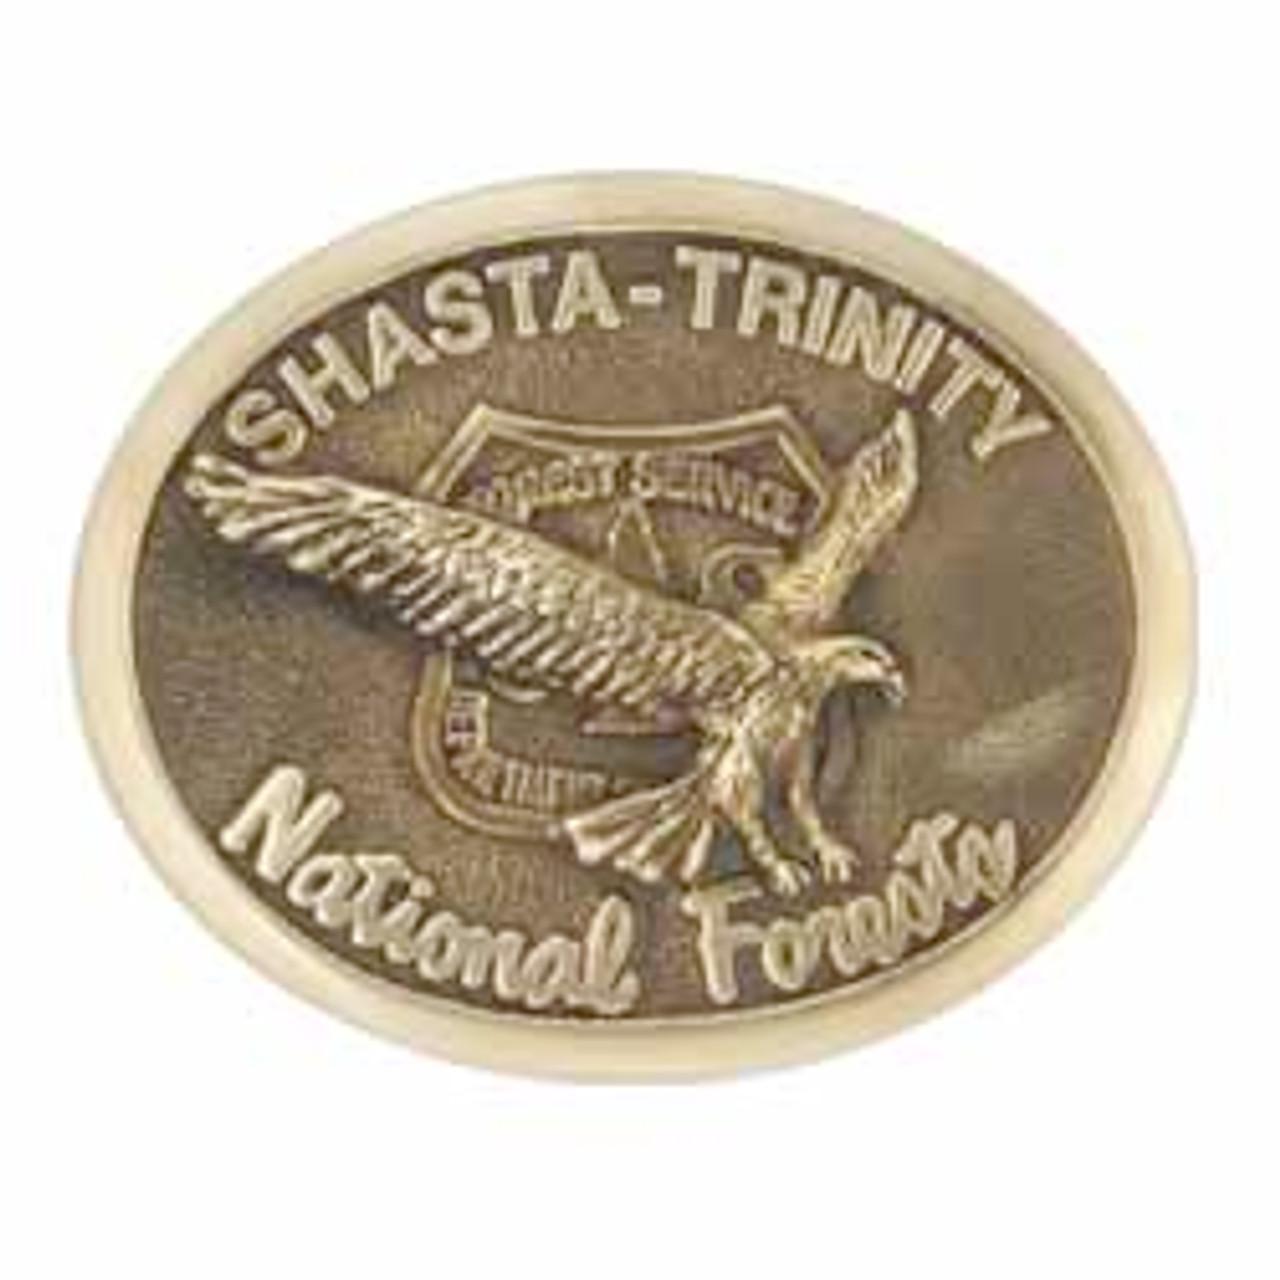 Shasta Trinity National Forest Buckle